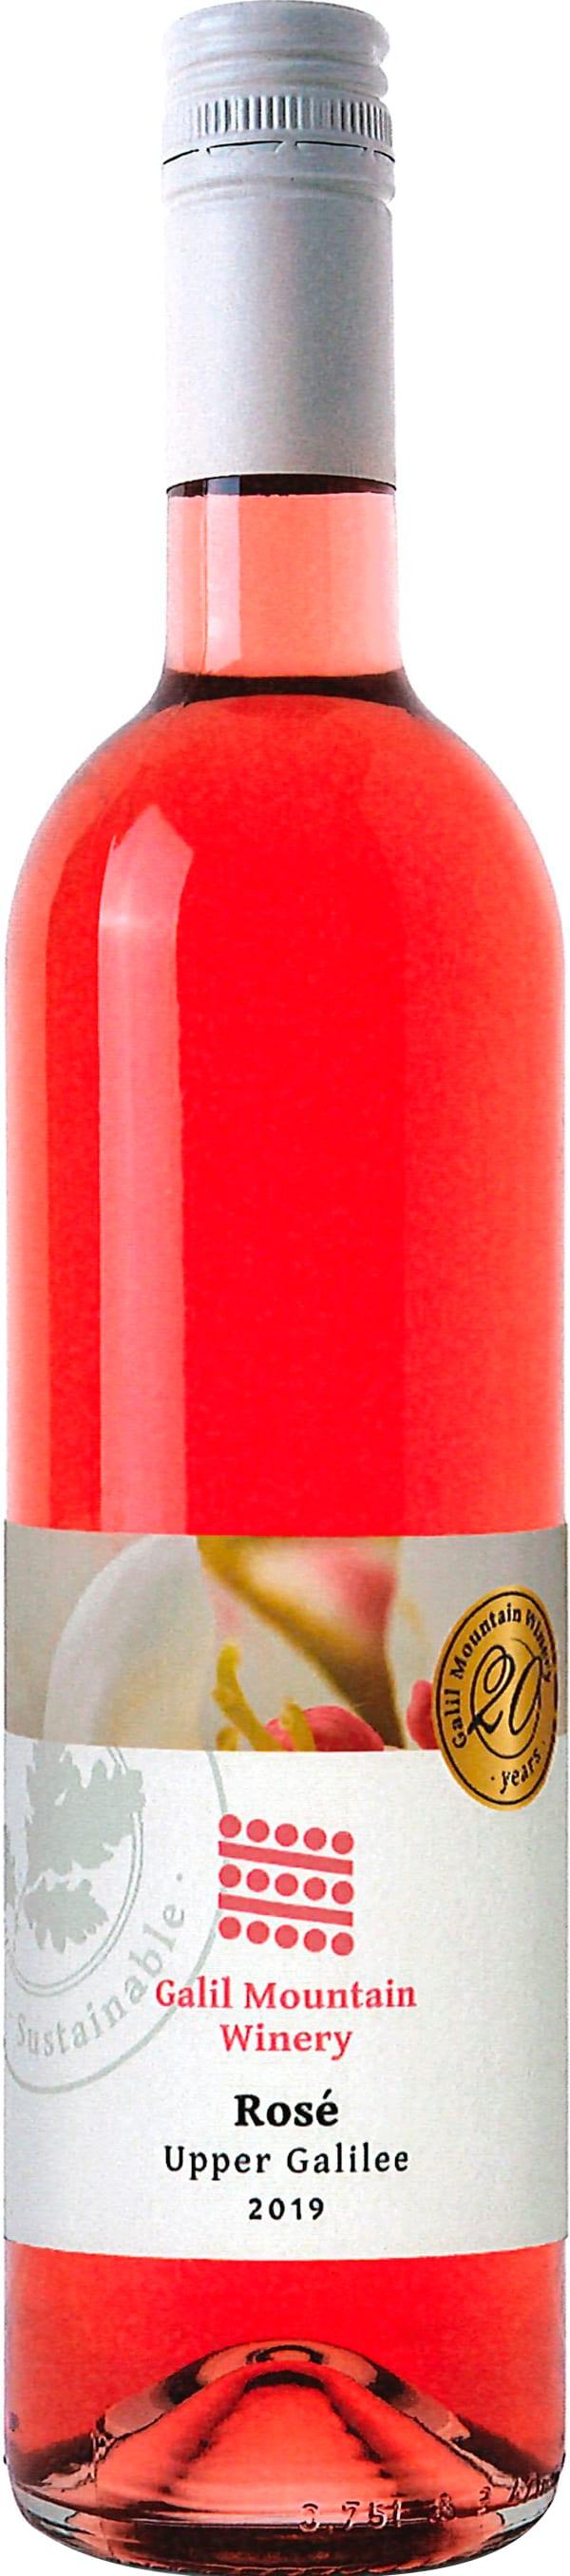 Galil Mountain Rosé 2019